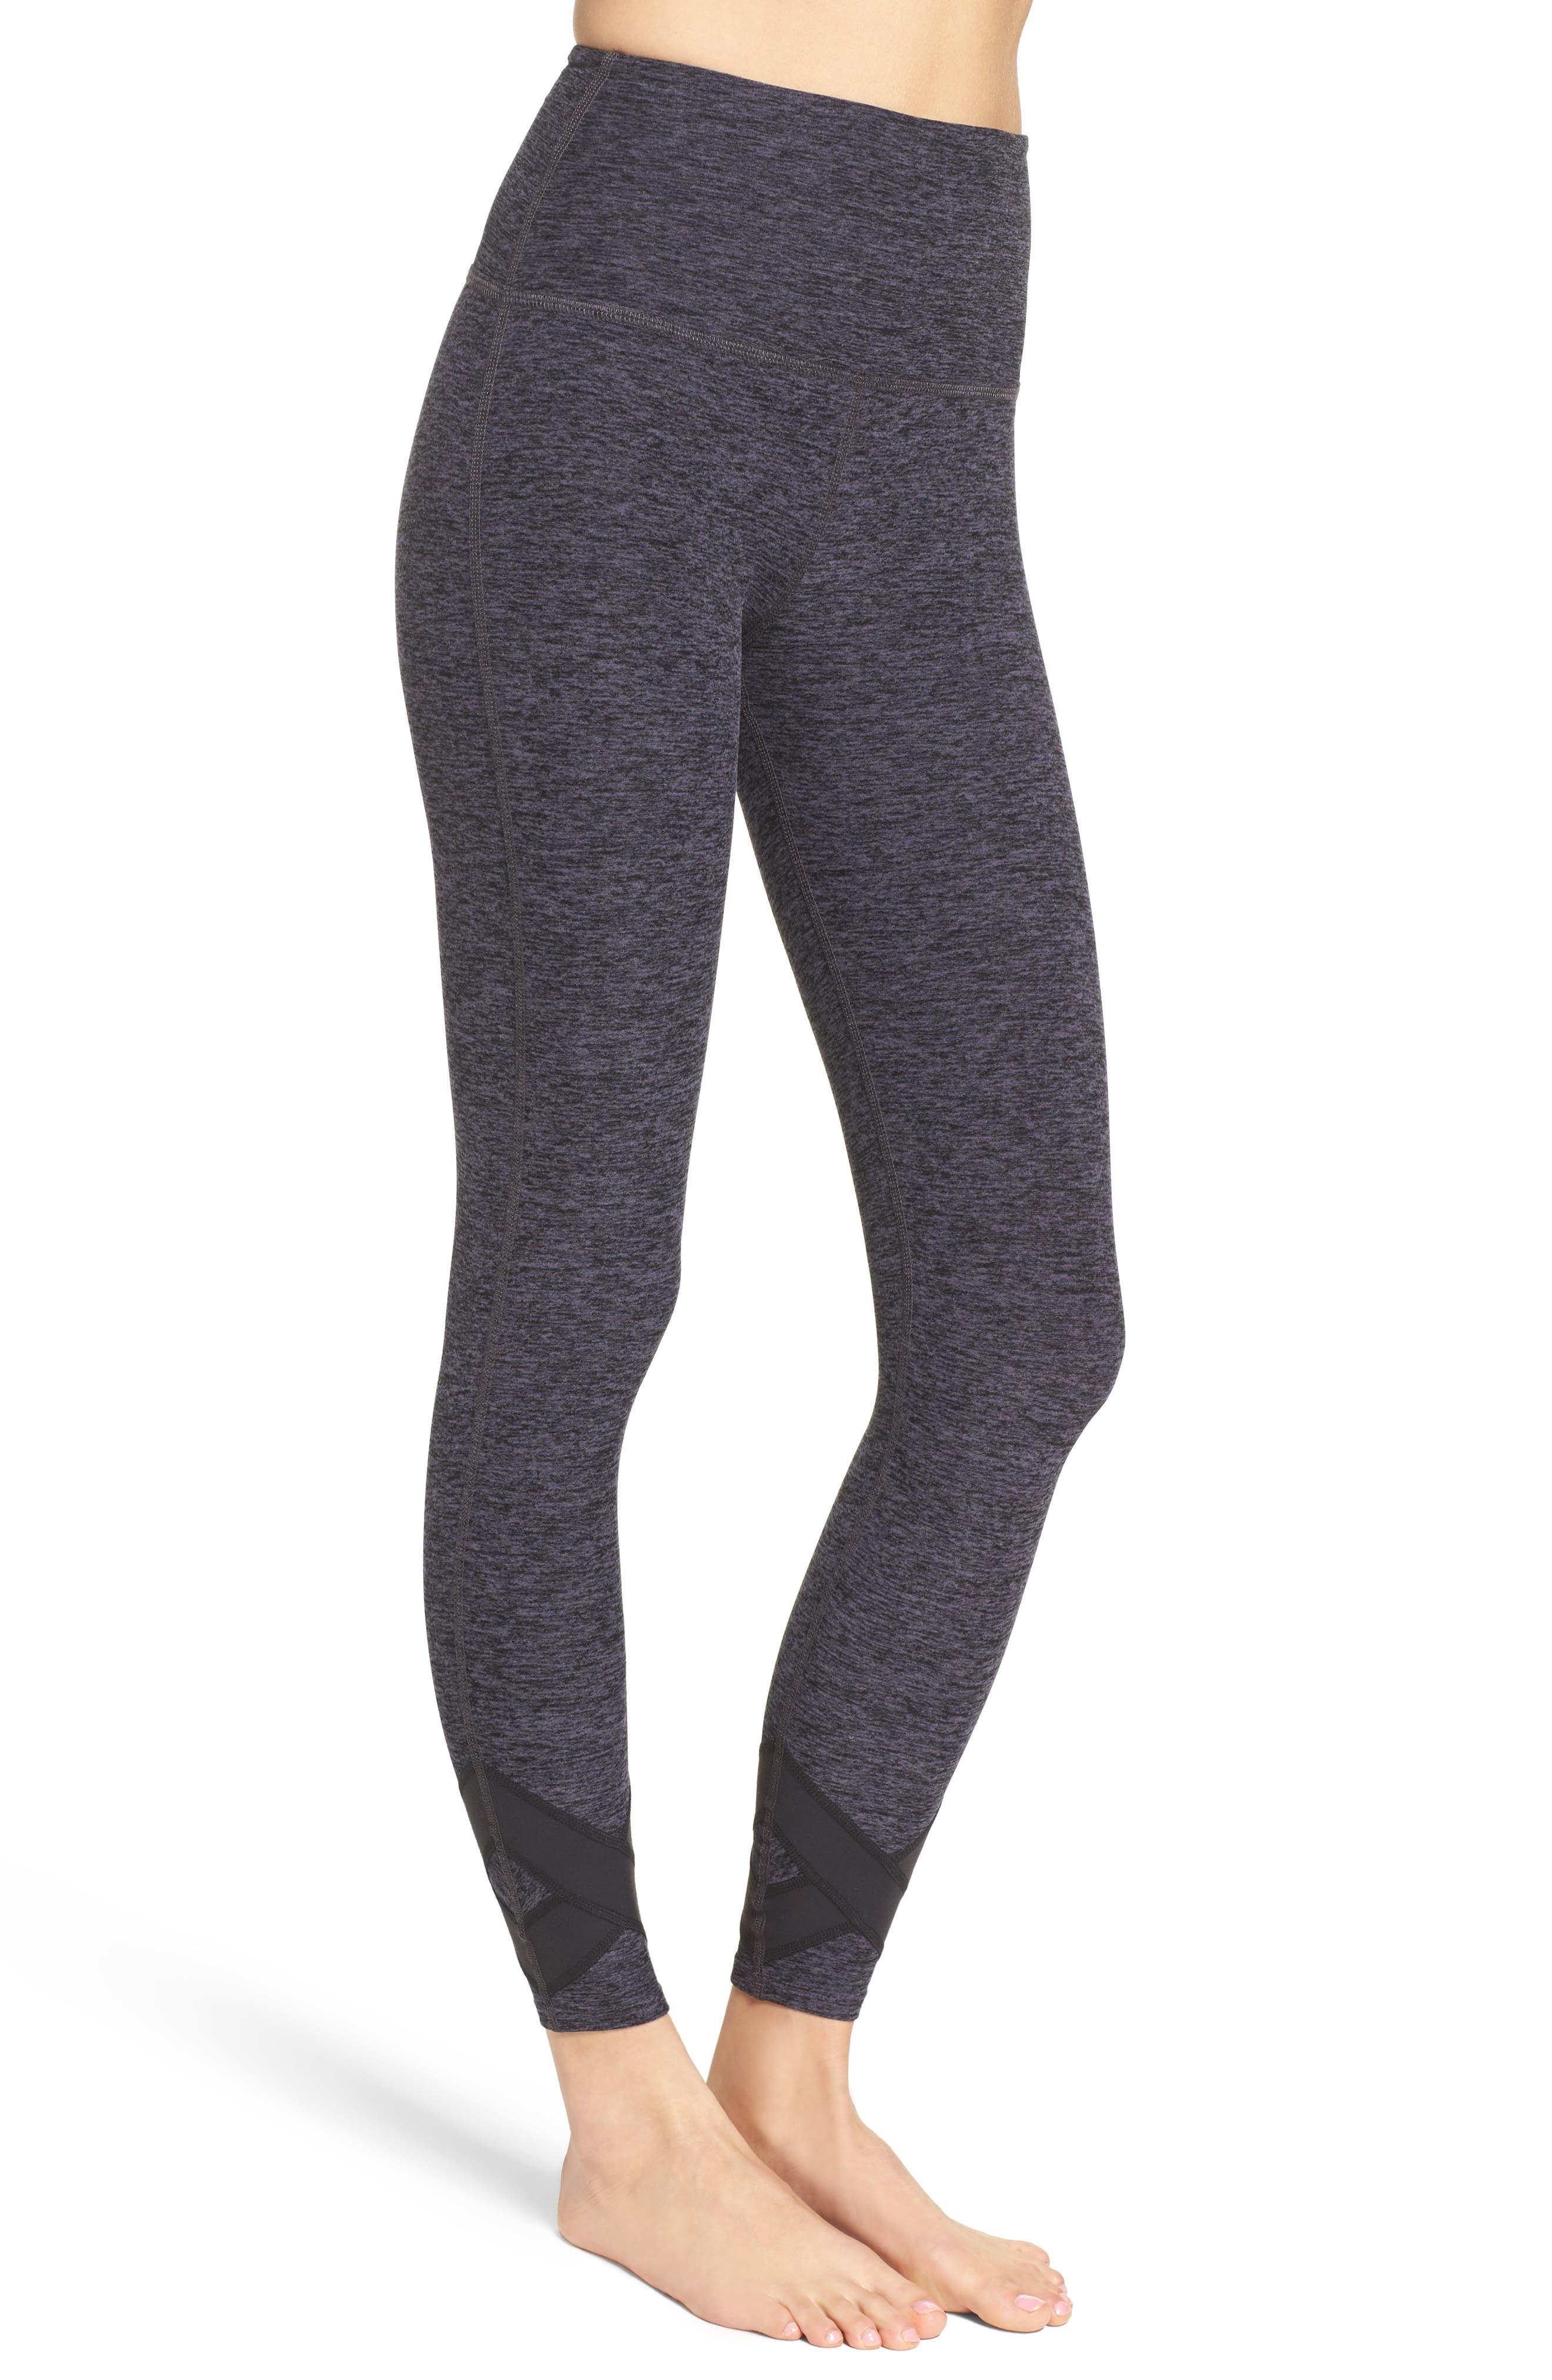 Alternate Image 3  - Beyond Yoga X Big Thing High Waist Leggings